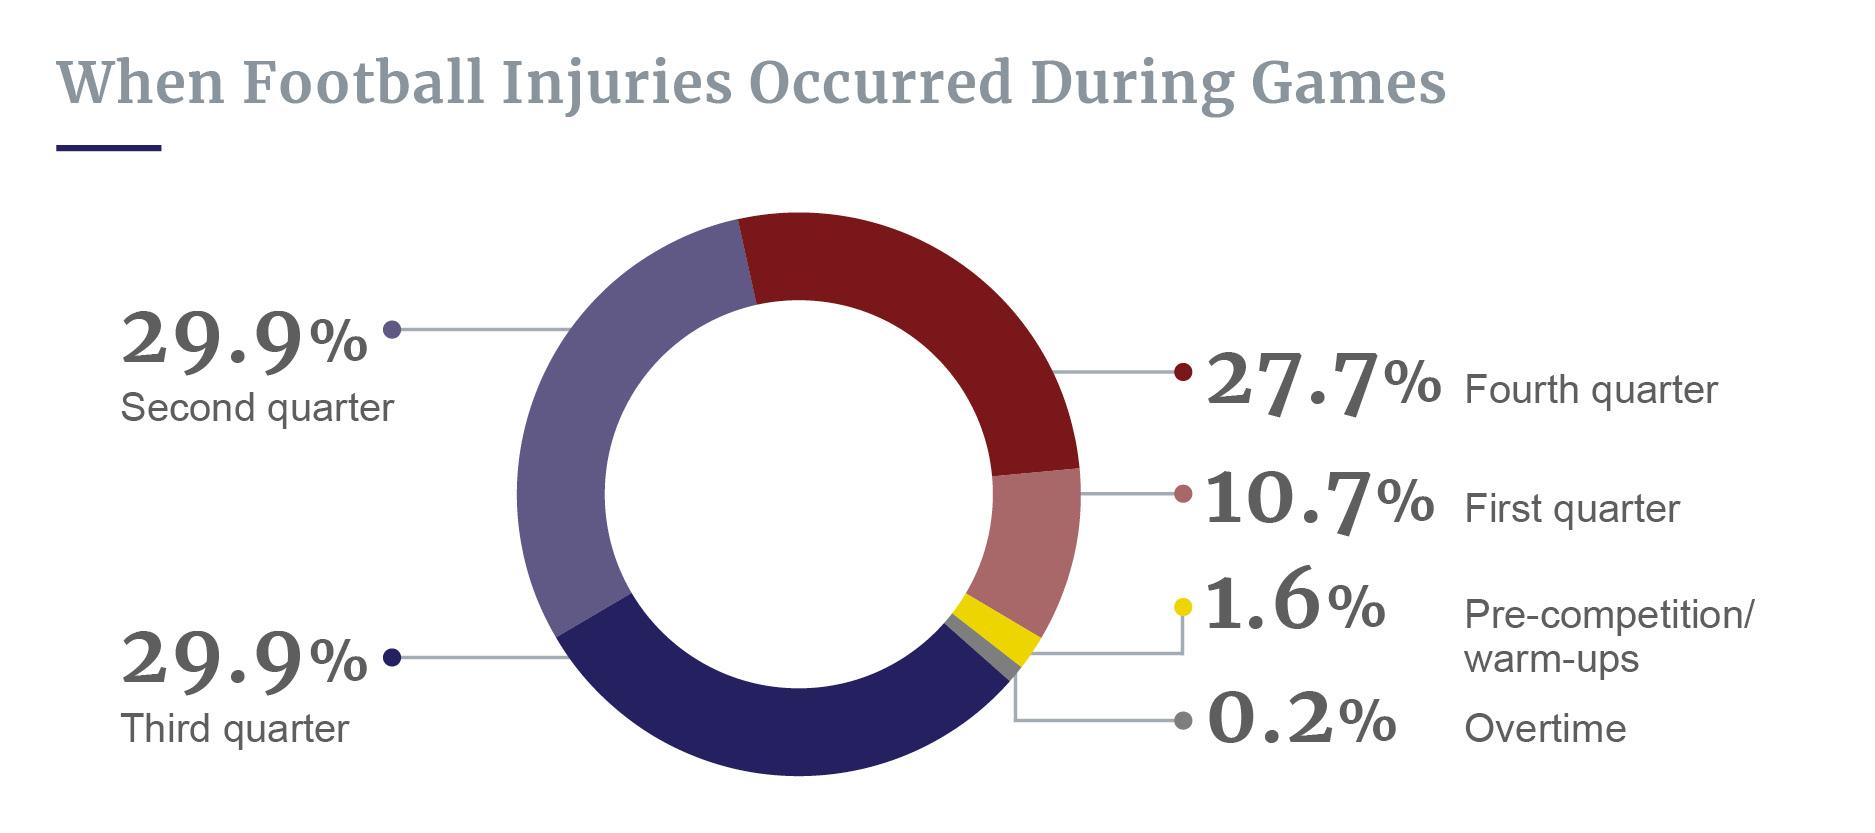 Football injuries during games